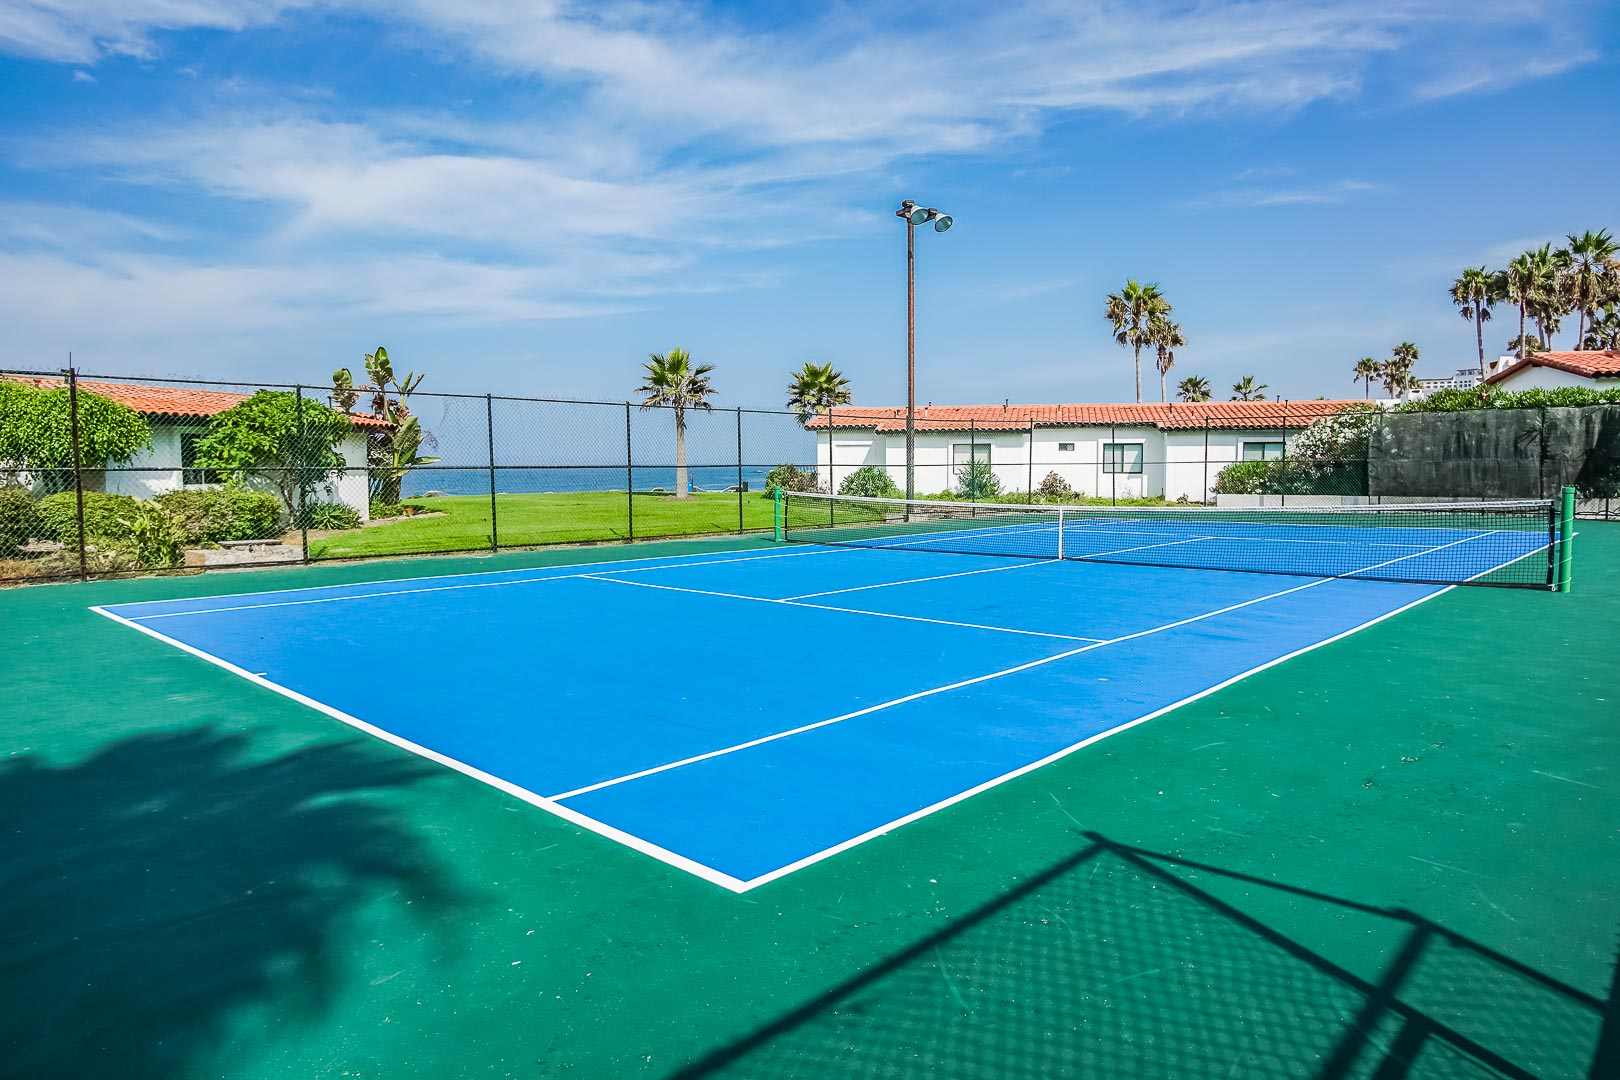 La Paloma - Tennis Court